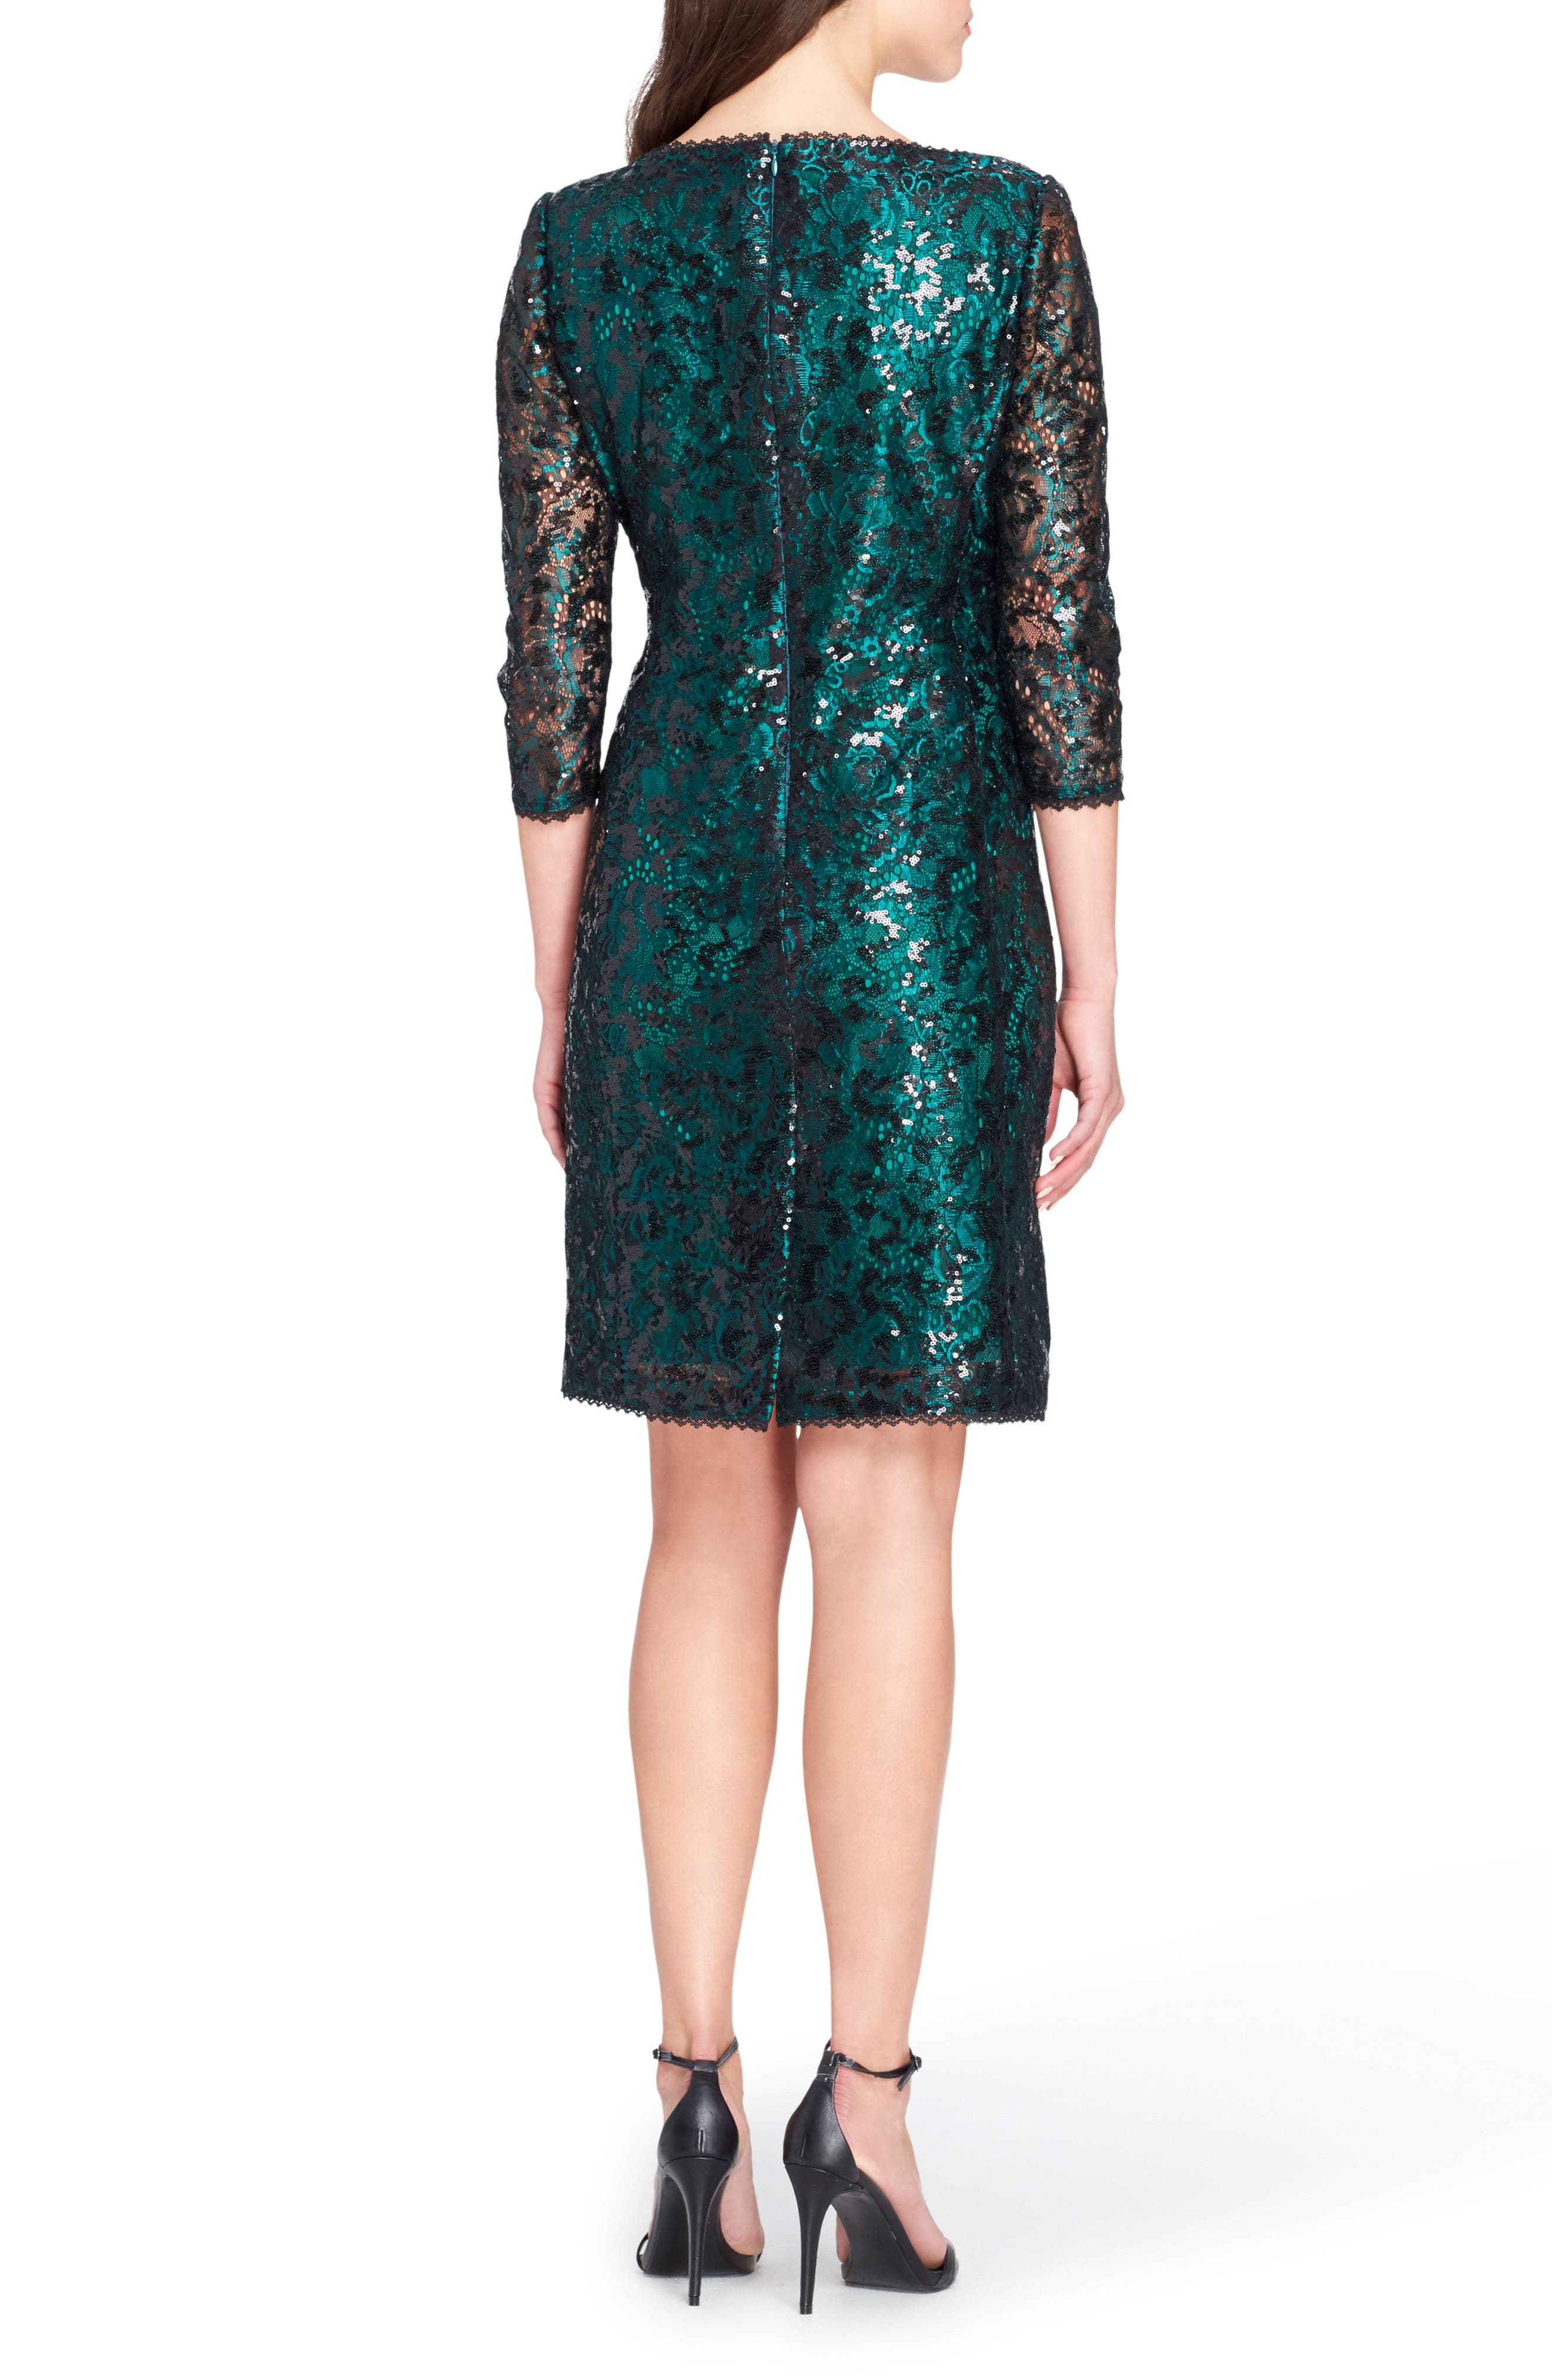 Chemical Lace Sheath Dress,                             Alternate thumbnail 2, color,                             Emerald Green/ Black